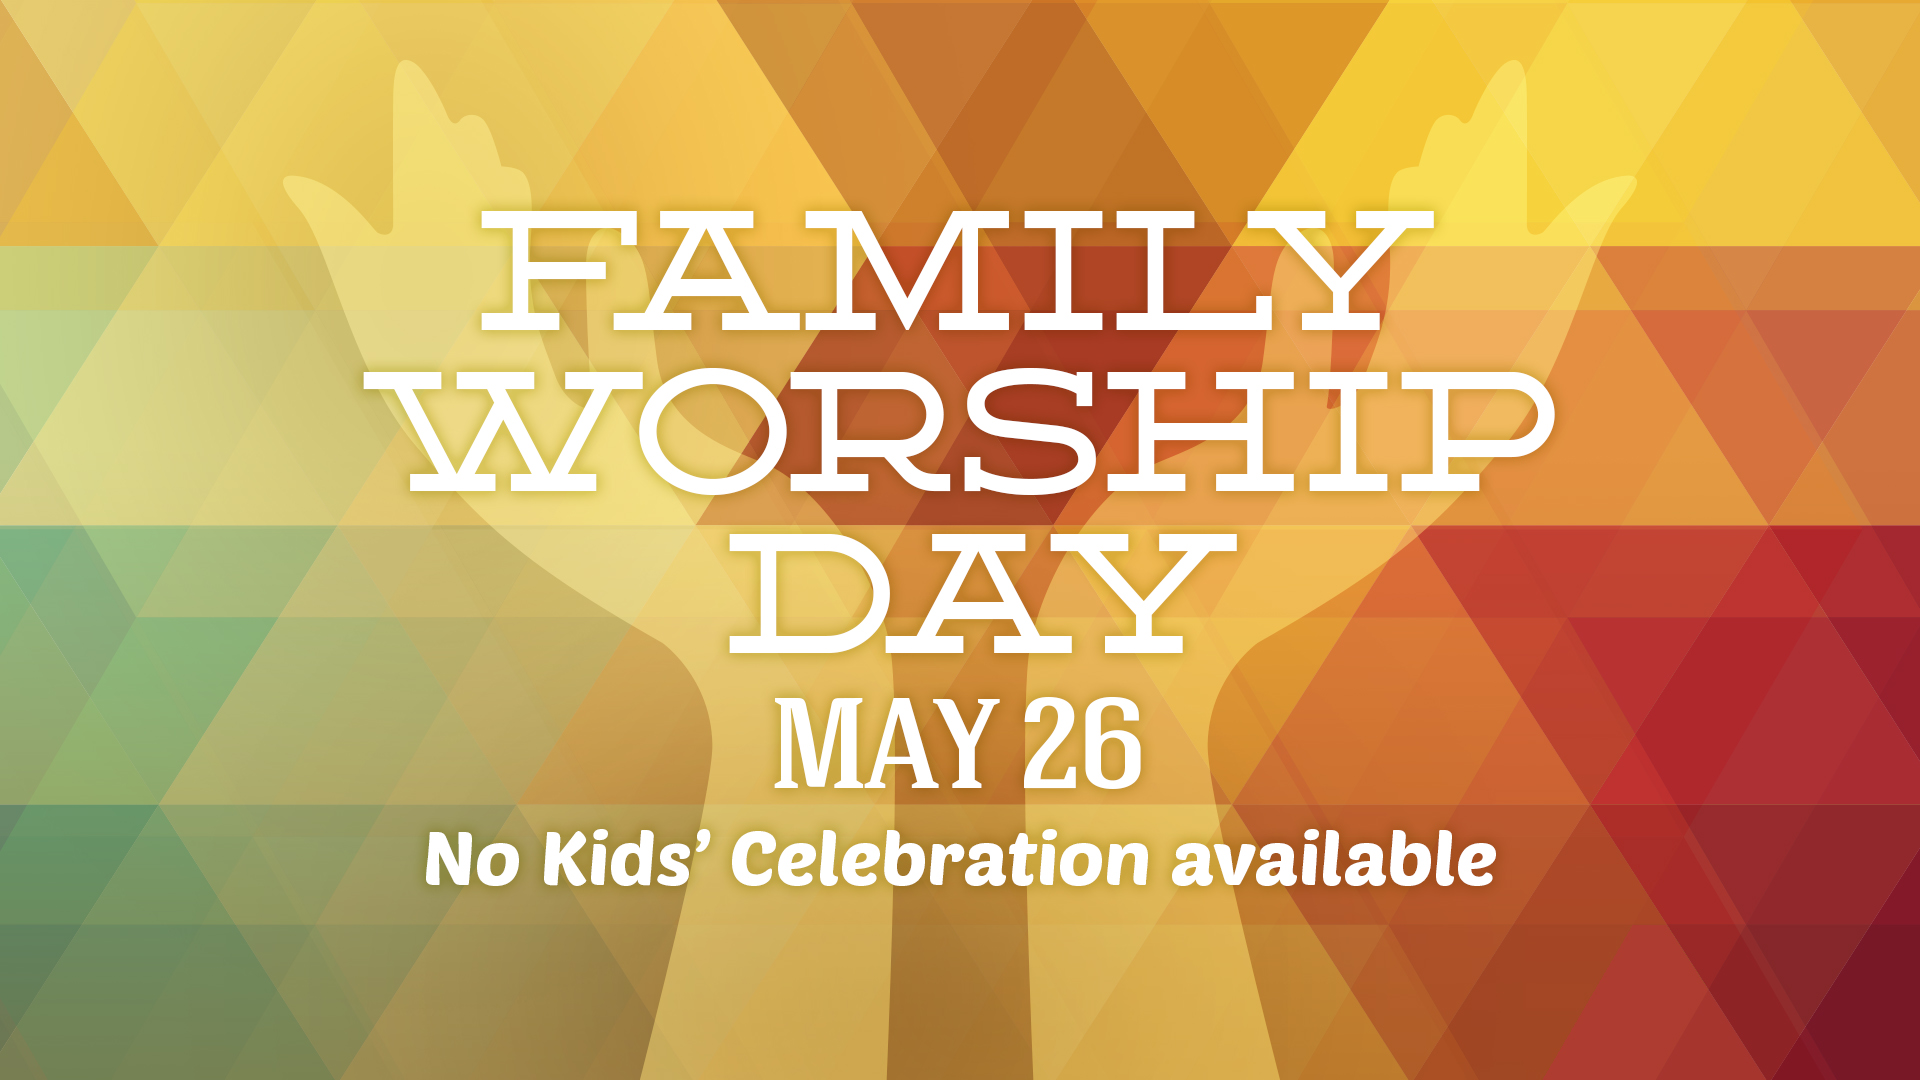 Saratoga Family Worship Day